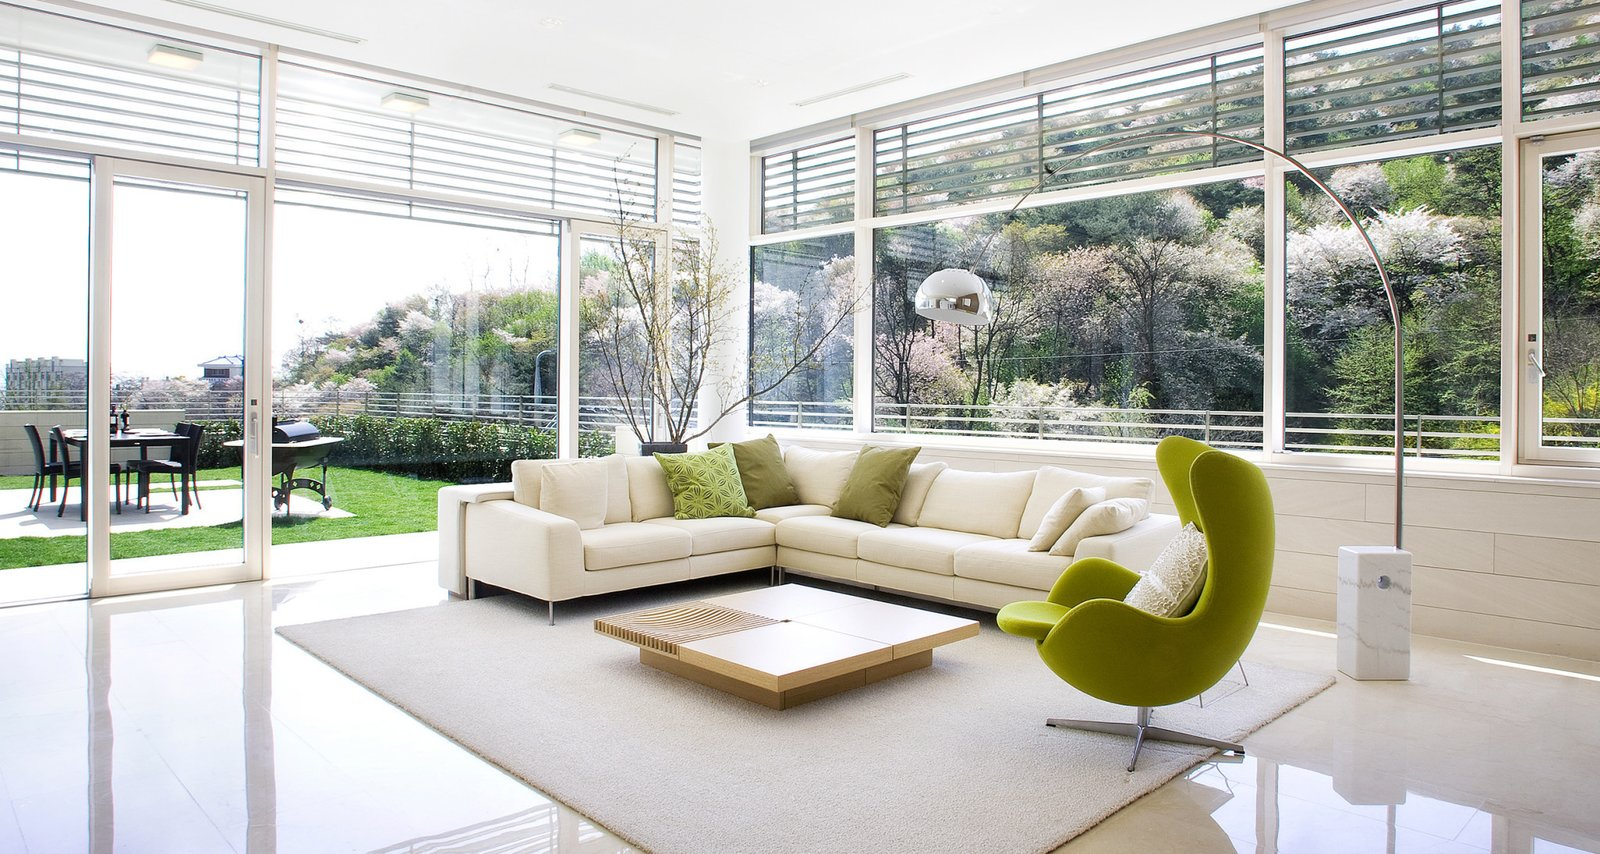 #SeongbukdongResidence #modern #midcentury #enclave #sustainable #L-shaped #interior #inside #livingroom #seating #table #outdoor #window #lighting #rug #chairs #backyard #Seoul #JoelSandersArchitects  Seongbukdong Residence